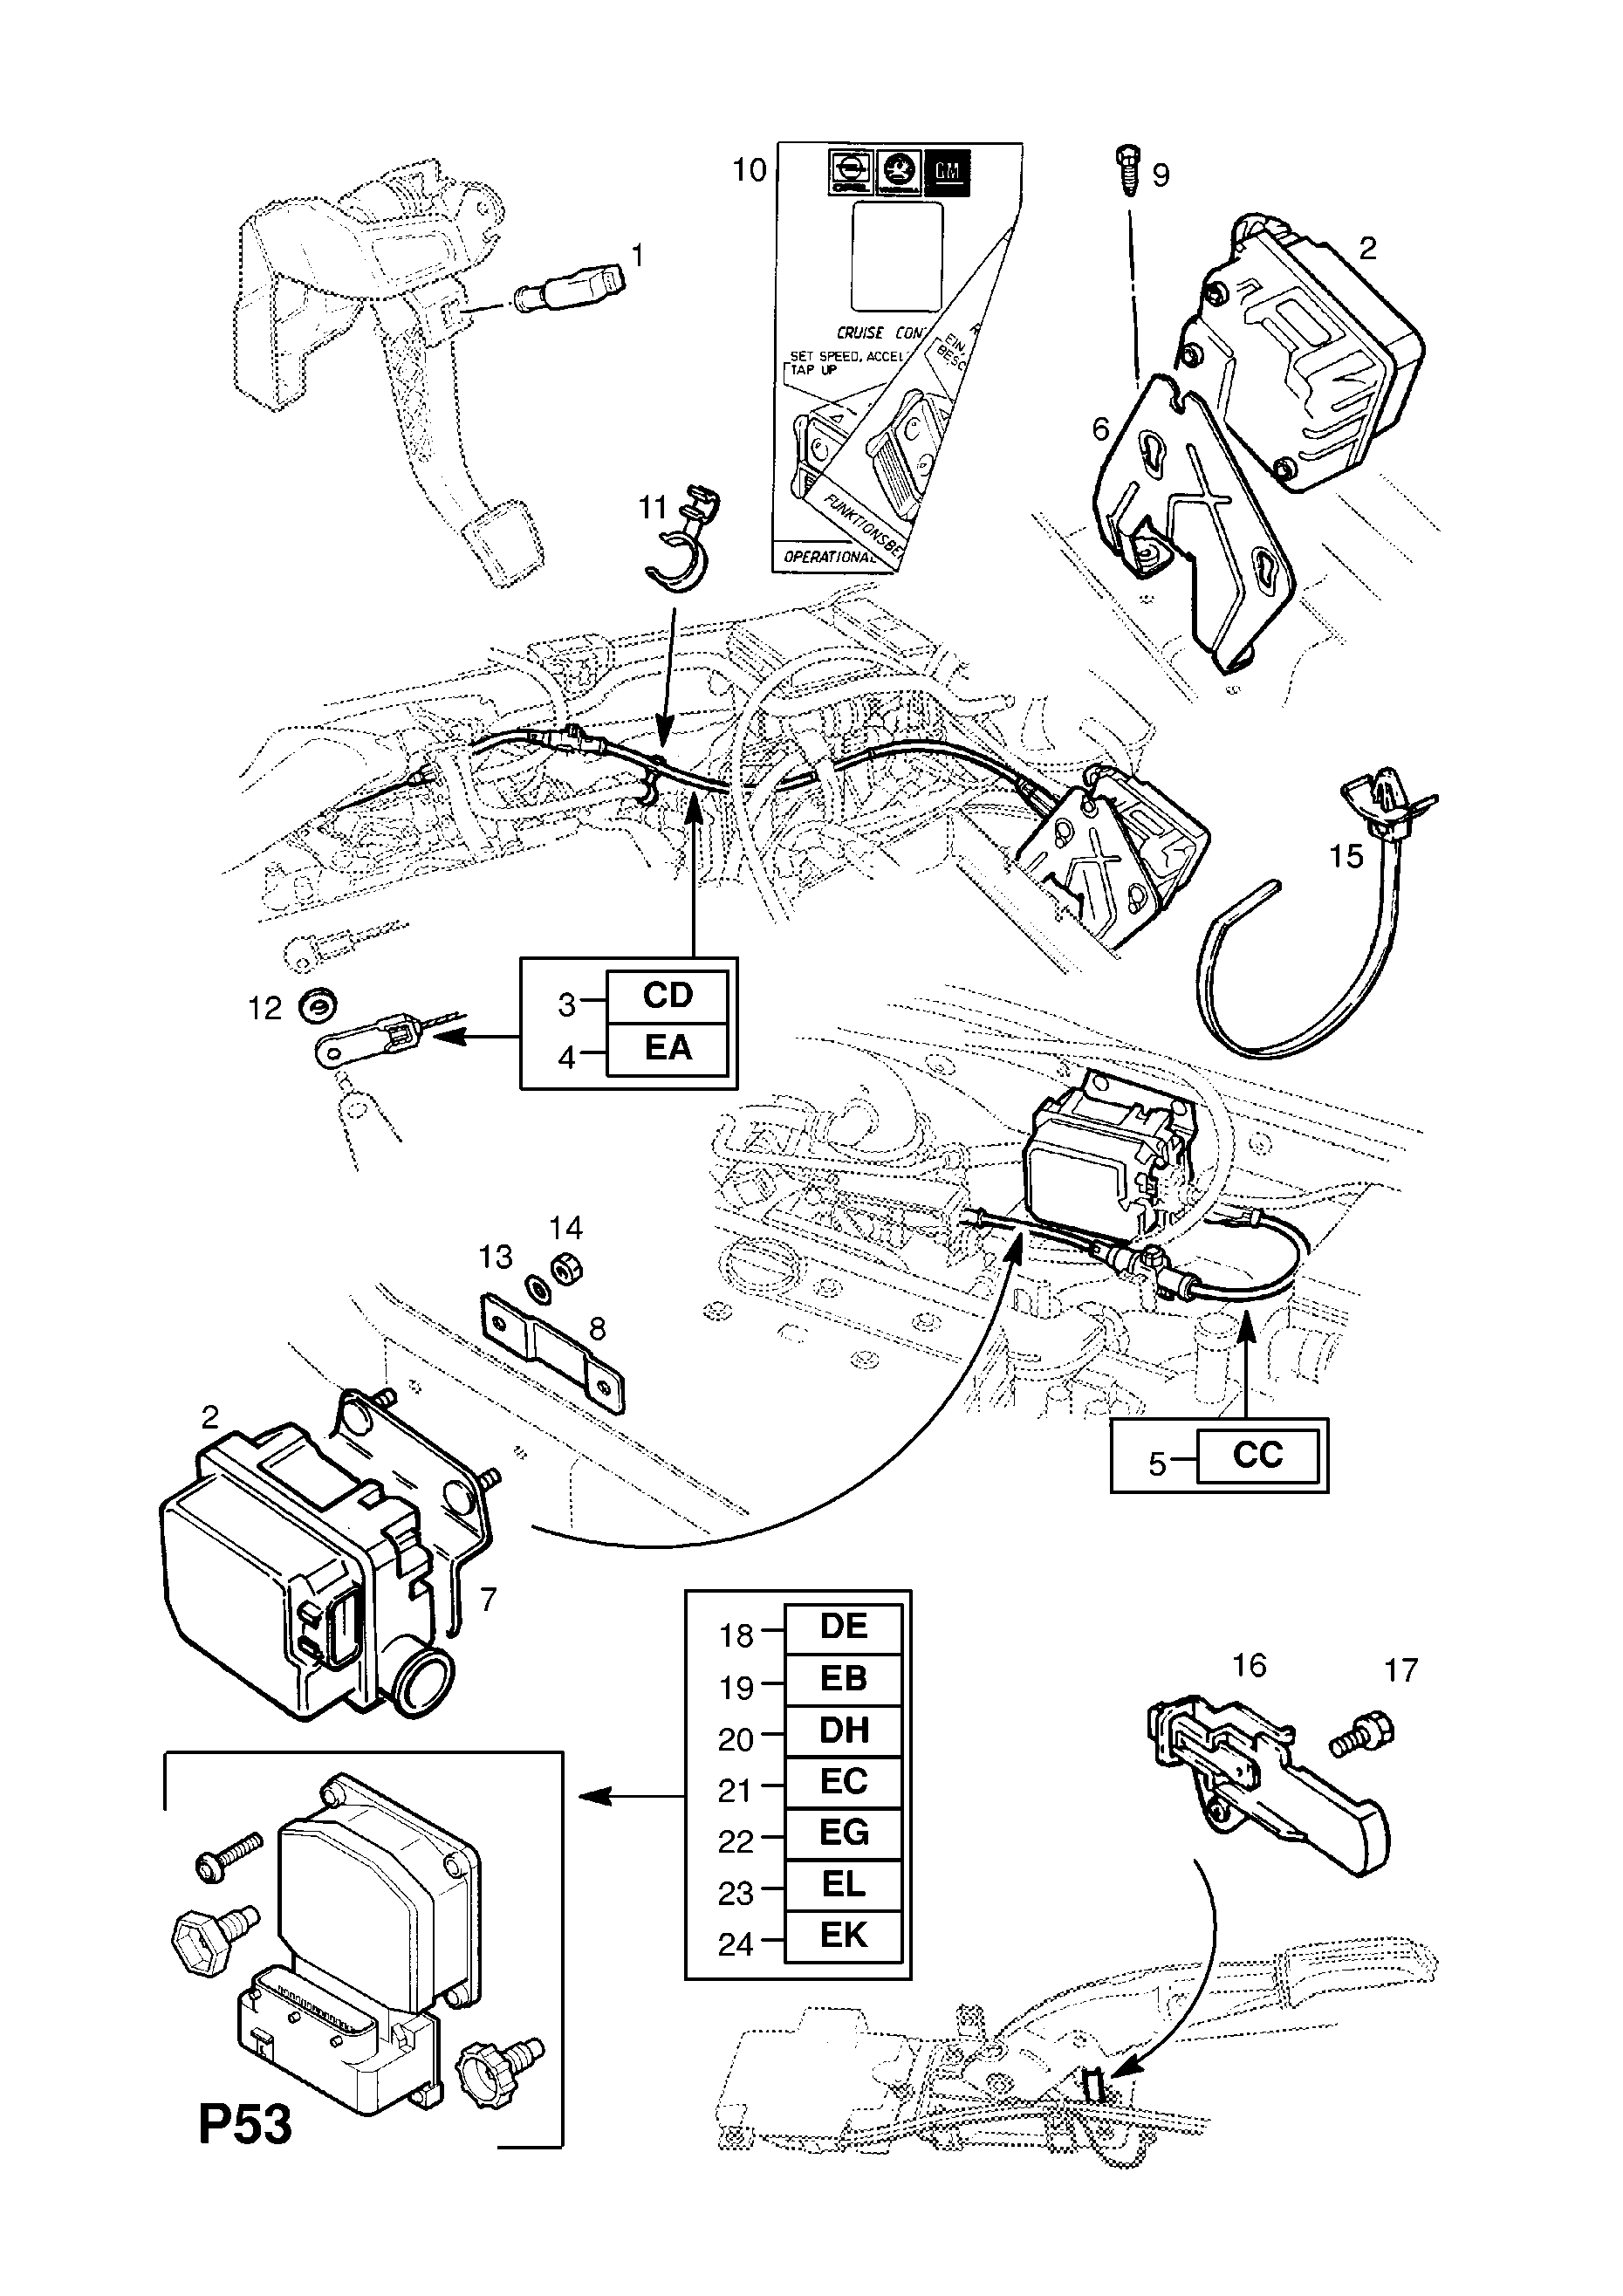 Opel Cruise Control Diagram Wiring Libraries Zafira Gsi Libraryopel Astra G A U003e Epc